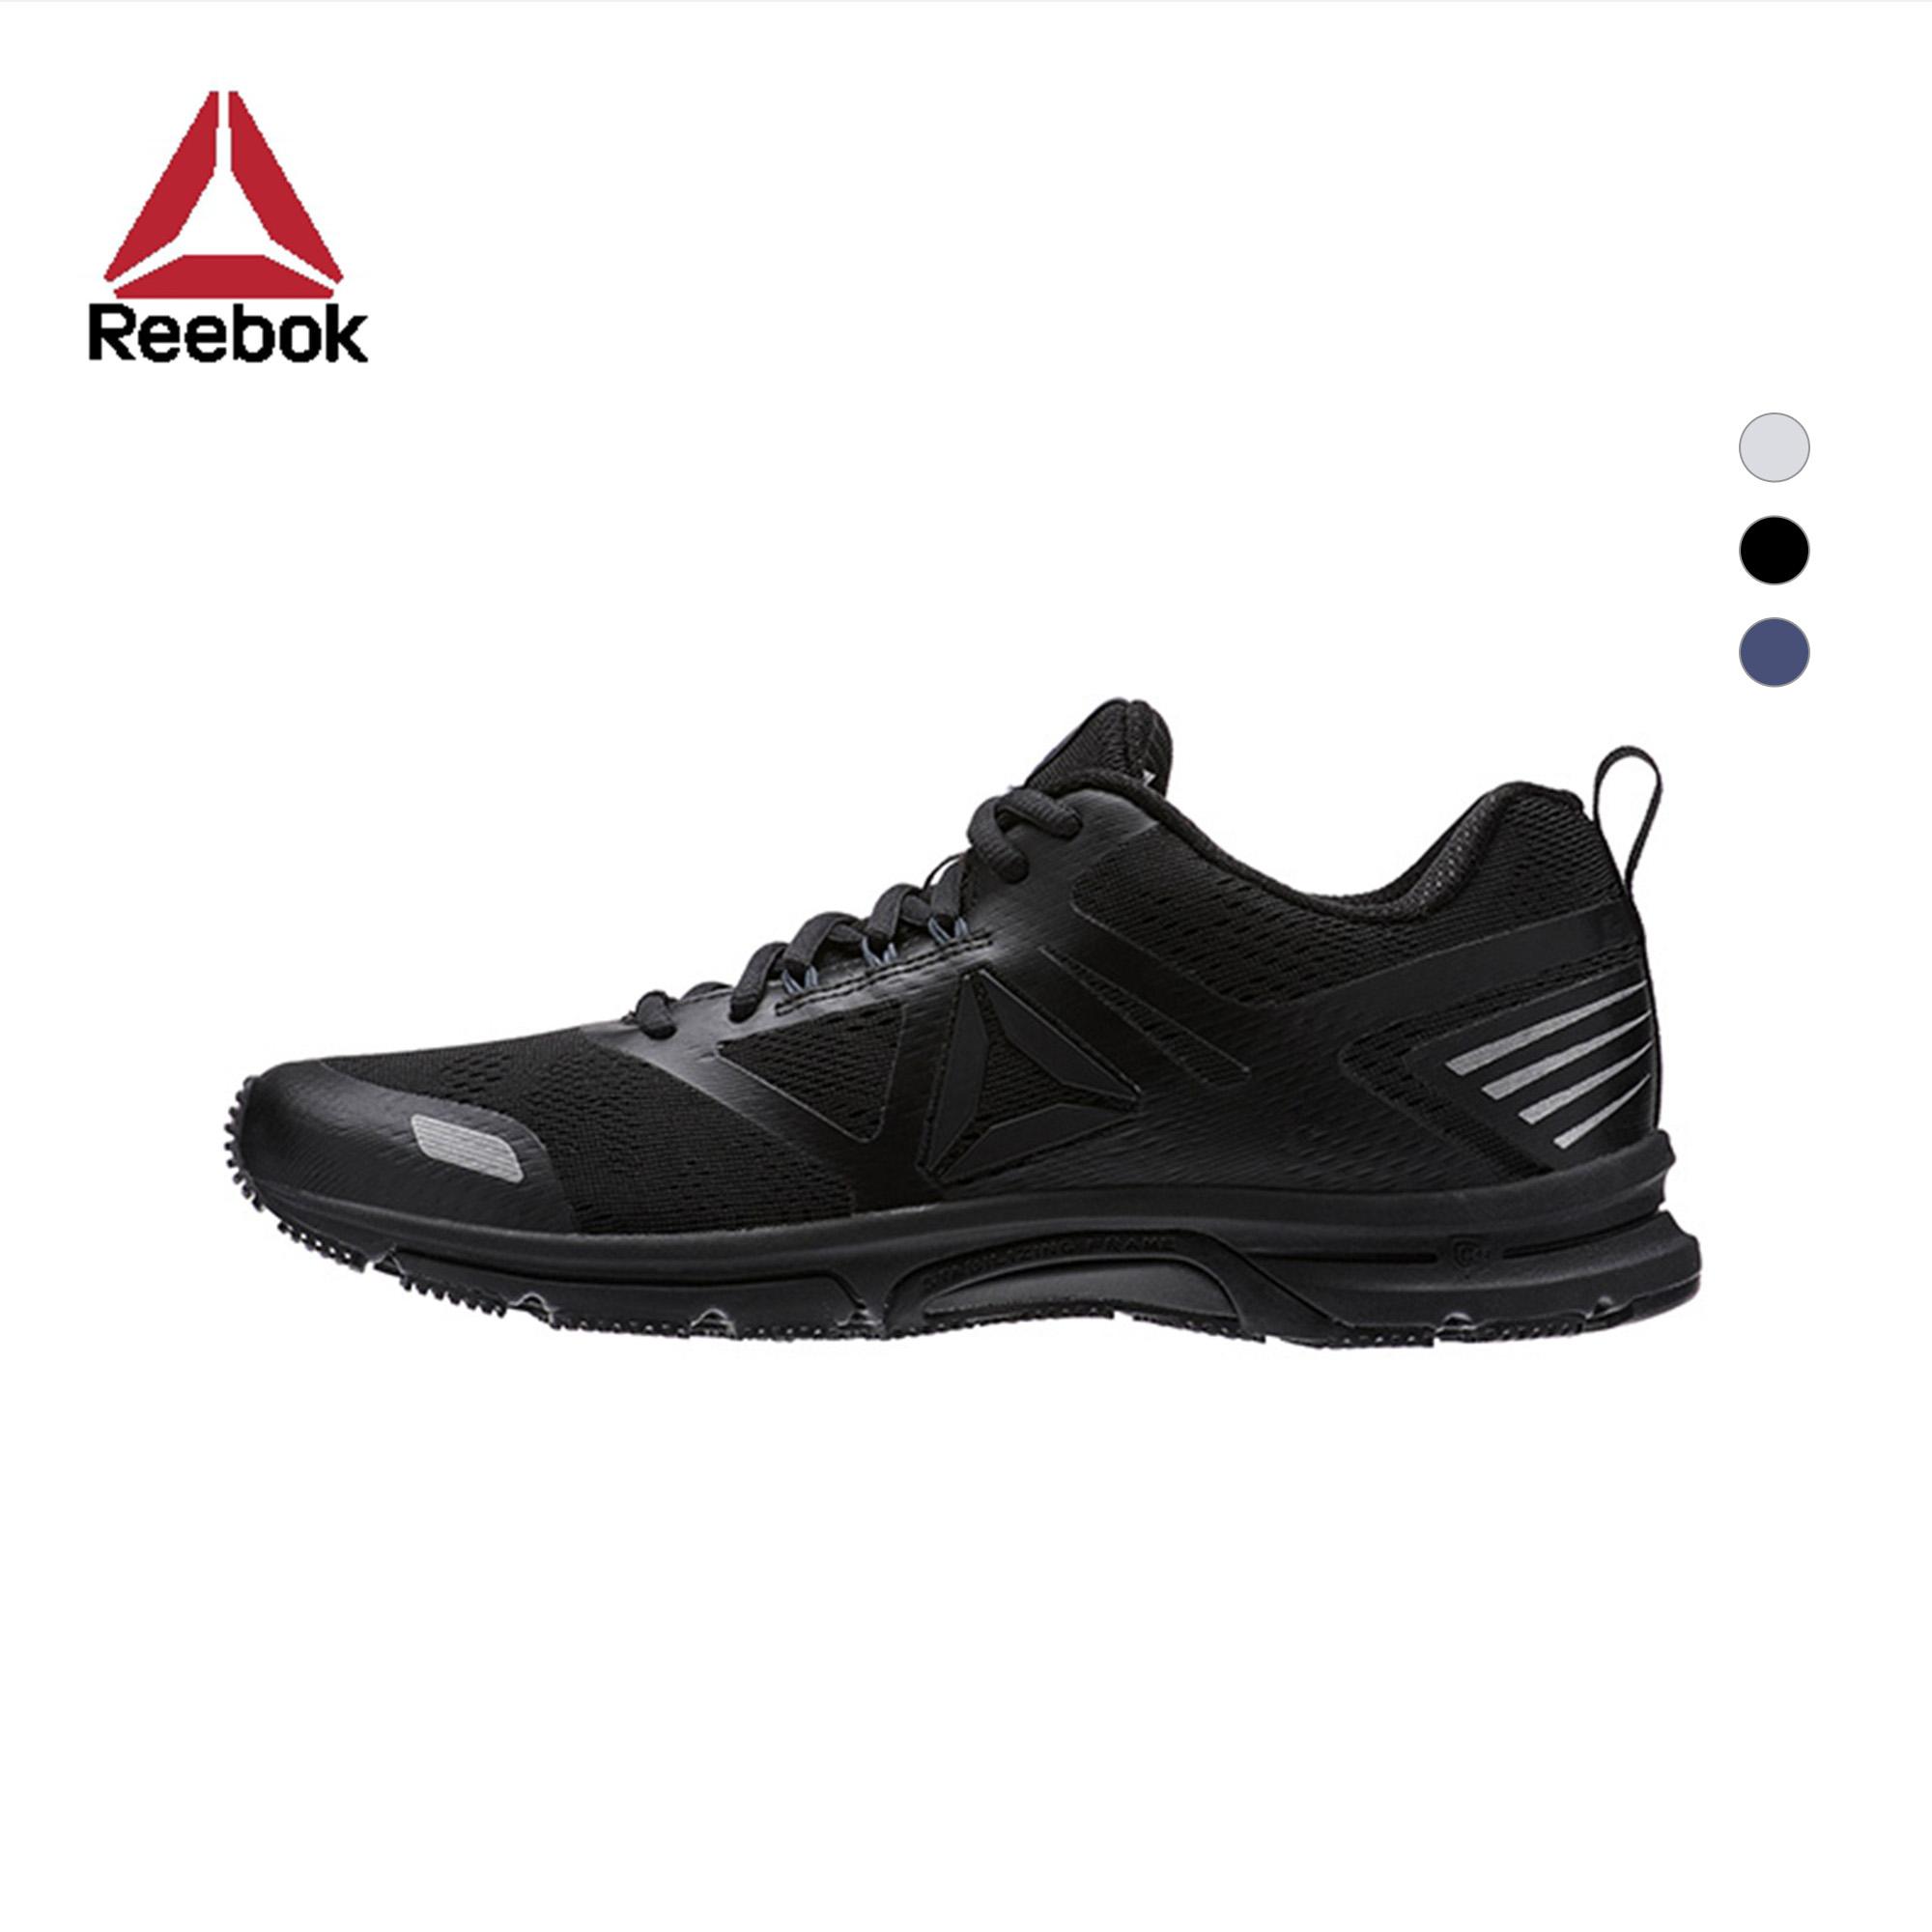 Reebok 锐步 AHARY RUNNER 男子跑步鞋运动鞋网眼低帮AWJ55